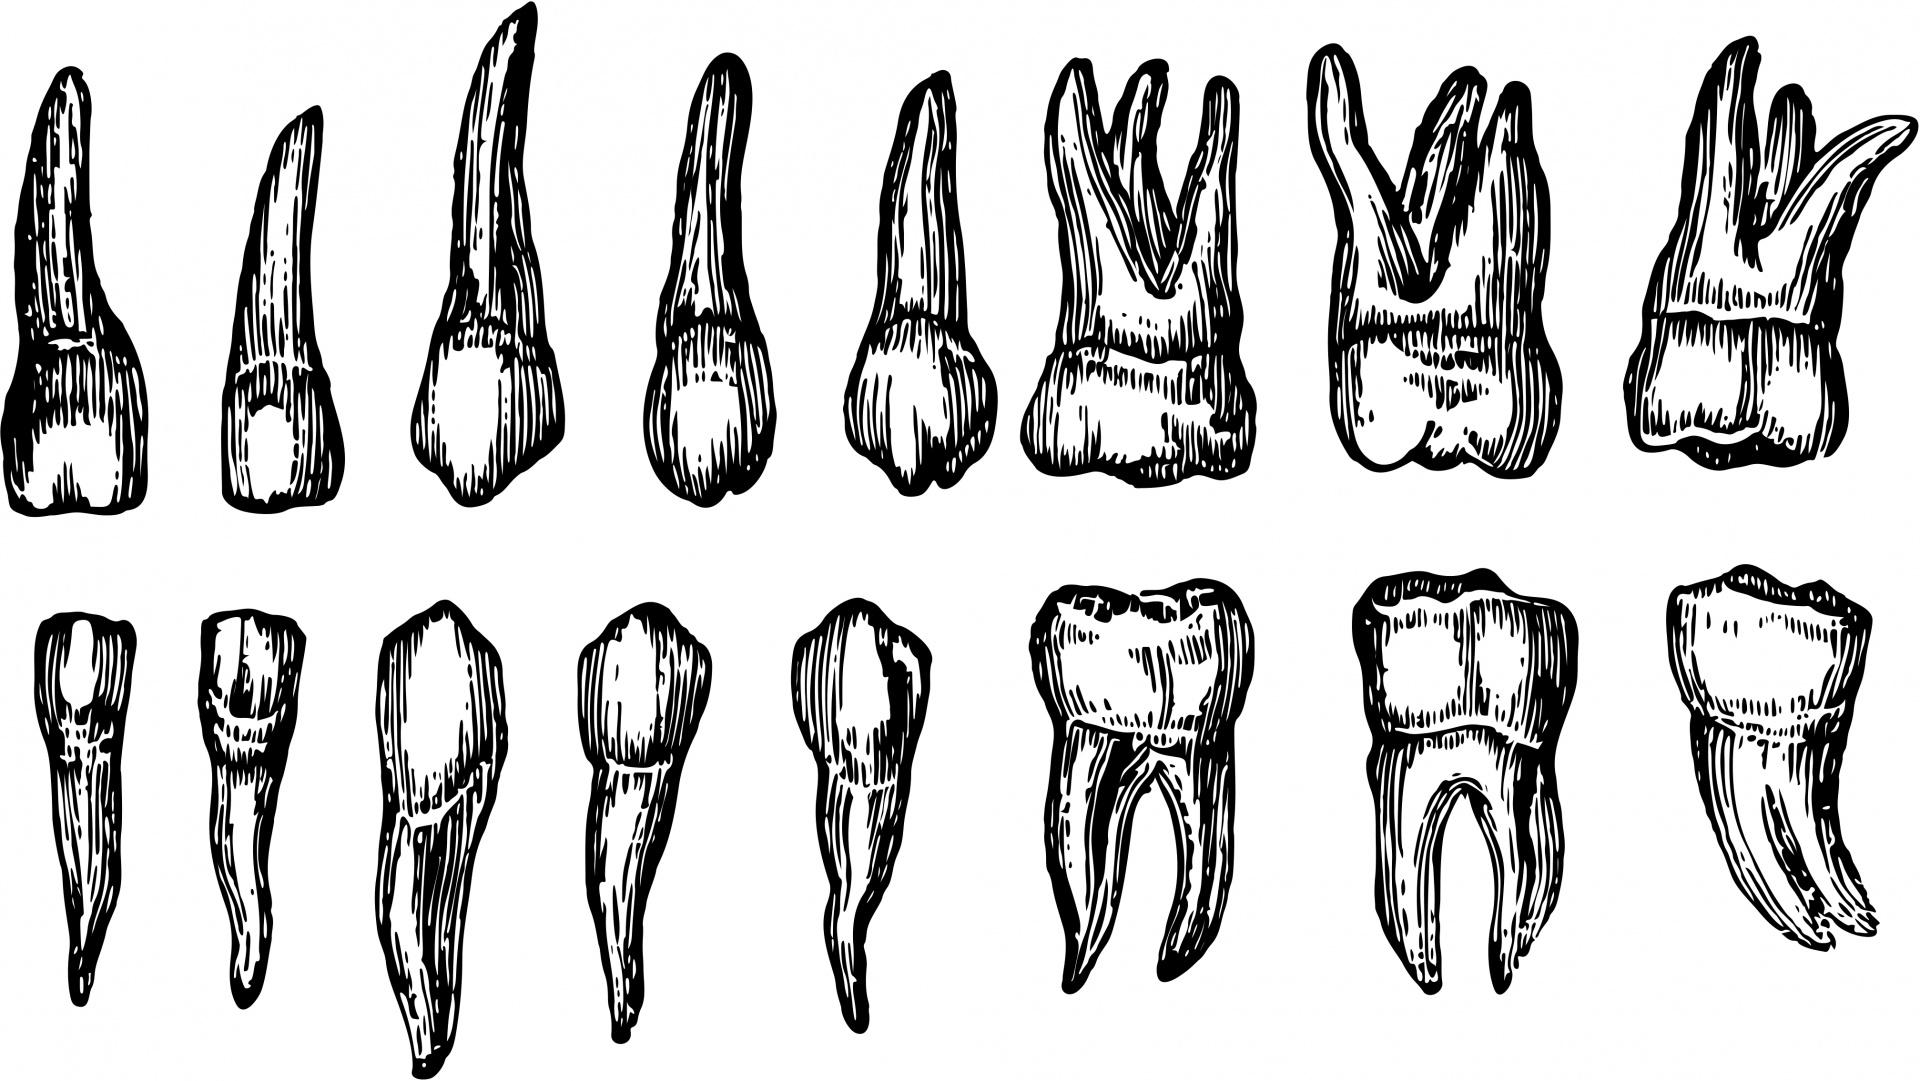 Human Teeth Free Stock Photo